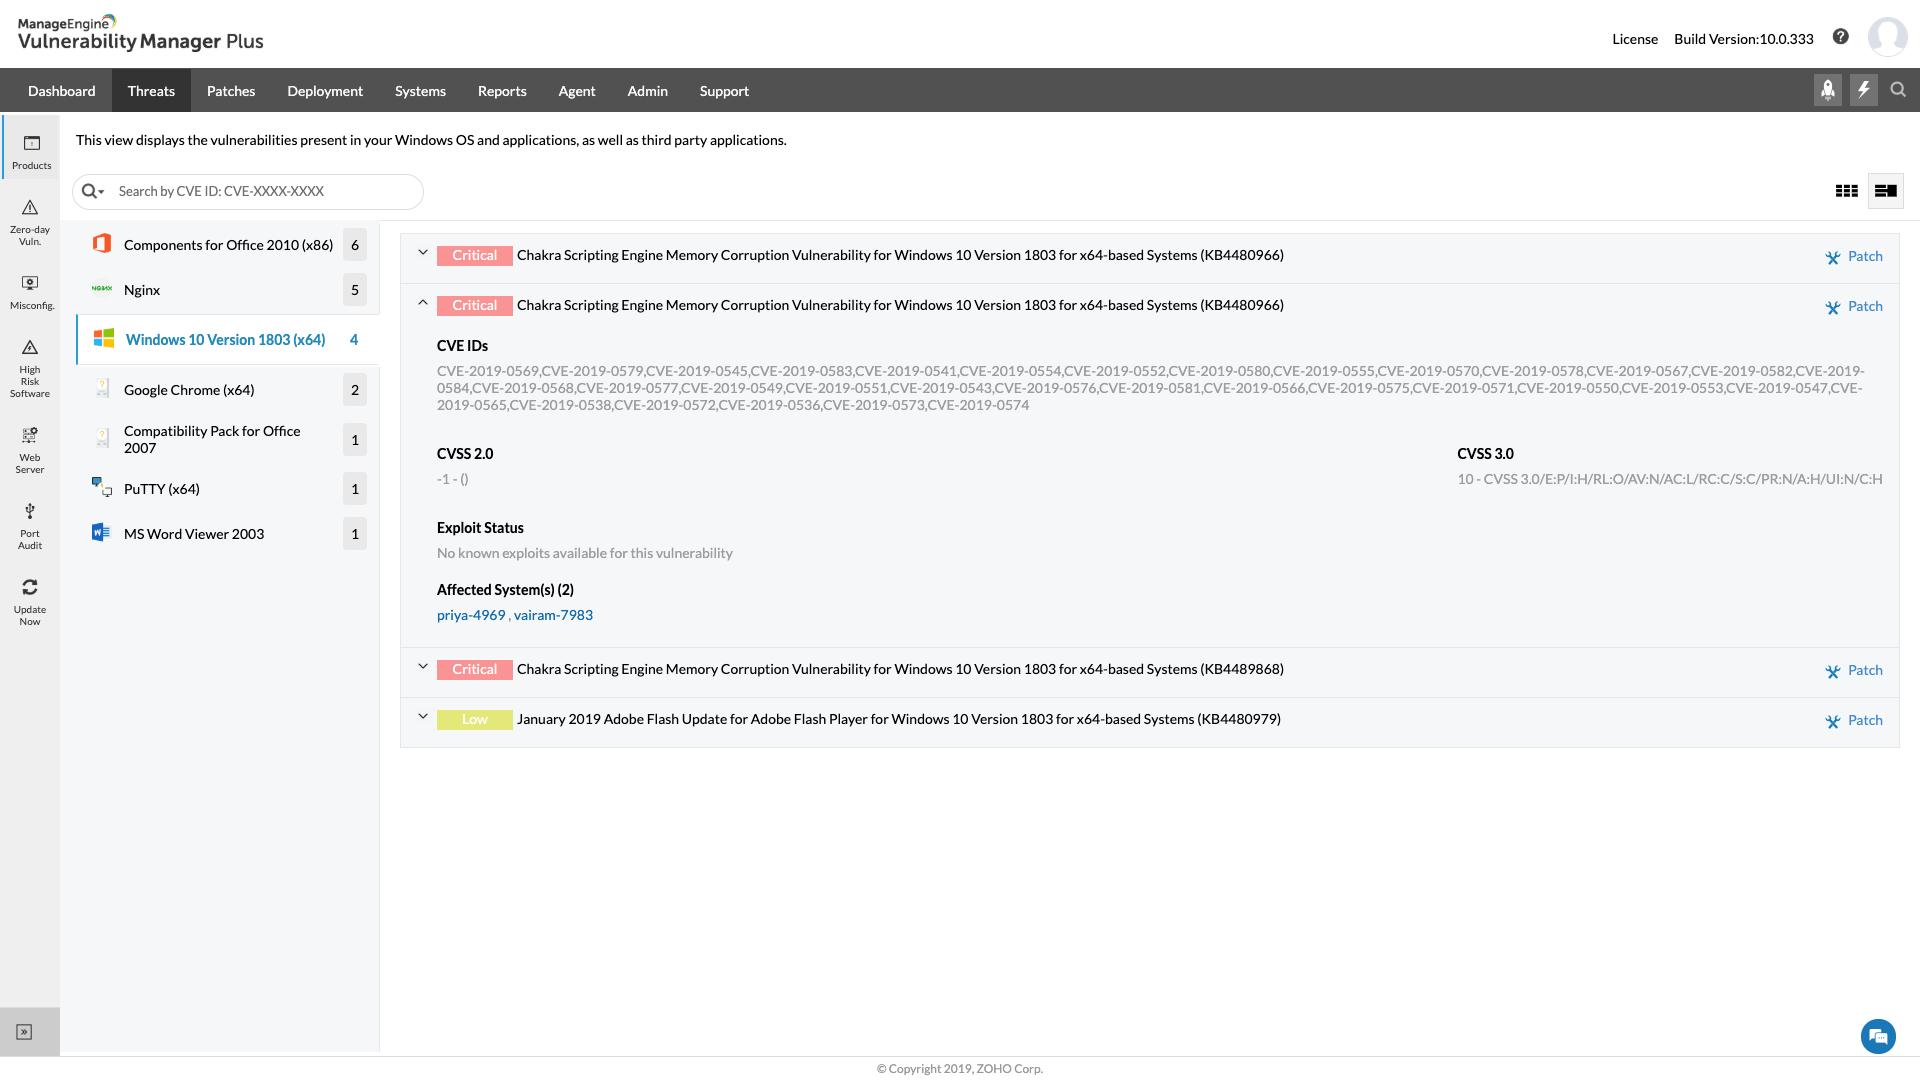 ManageEngine Vulnerability Manager Plus Software - Vulnerabilities